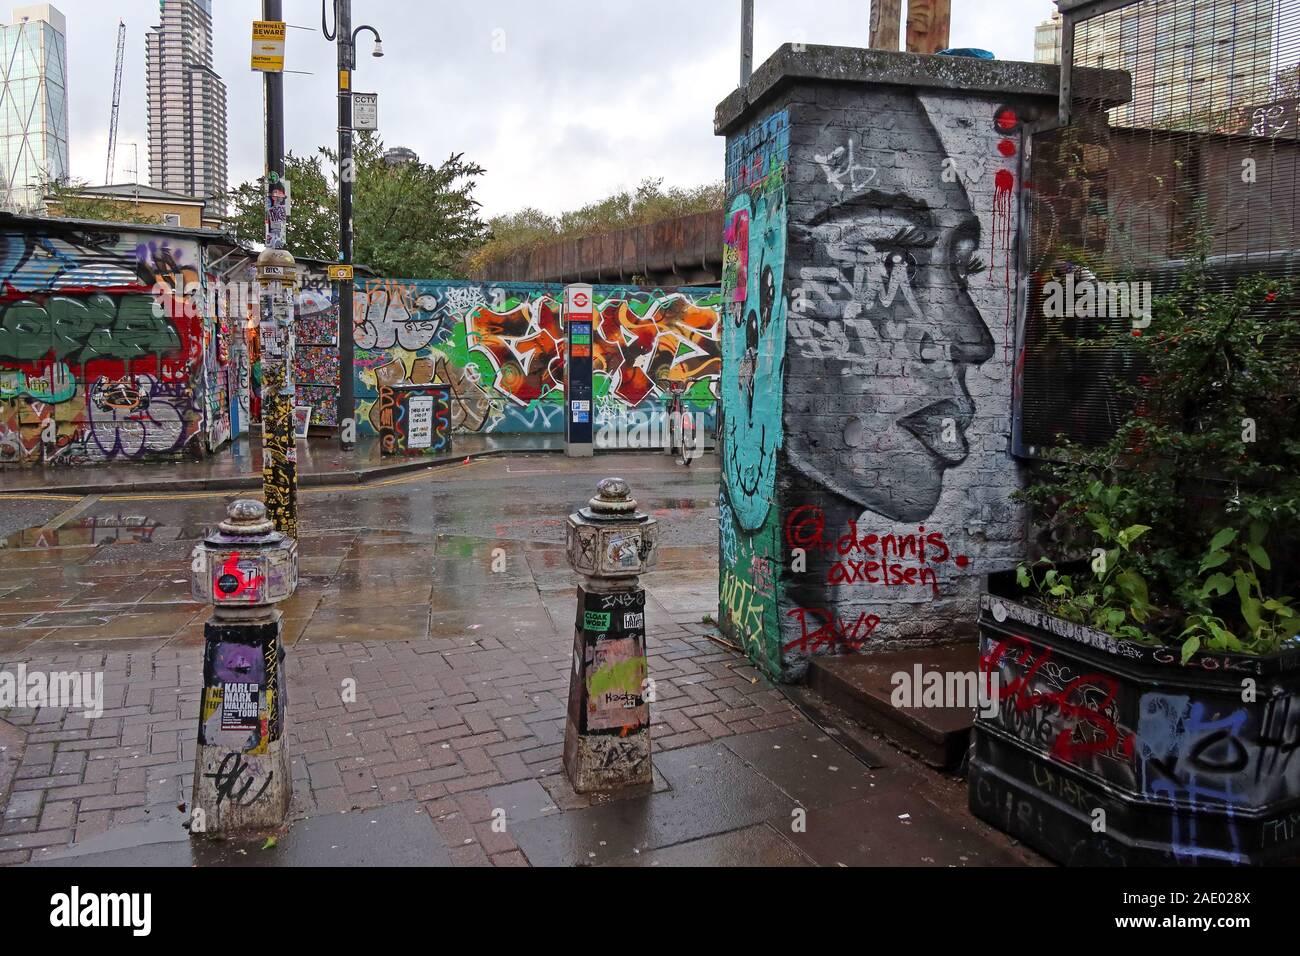 Dieses Stockfoto: Brick Lane, Kunst und Graffiti, Shoreditch, Tower Hamlets, East End, London, South East, England, Großbritannien, E1 6QL - 2AE028